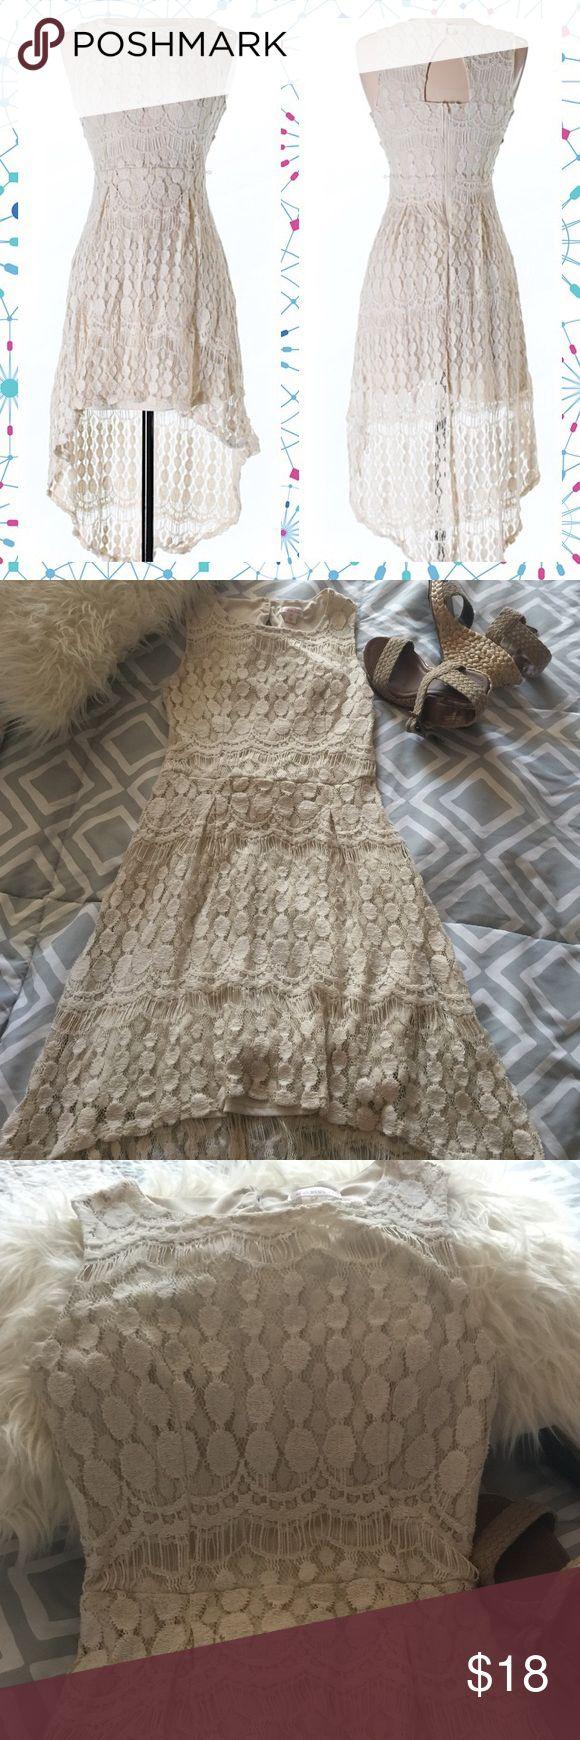 BEIGE LACE DRESS Beautiful beige lace dress size S. worn once Dresses